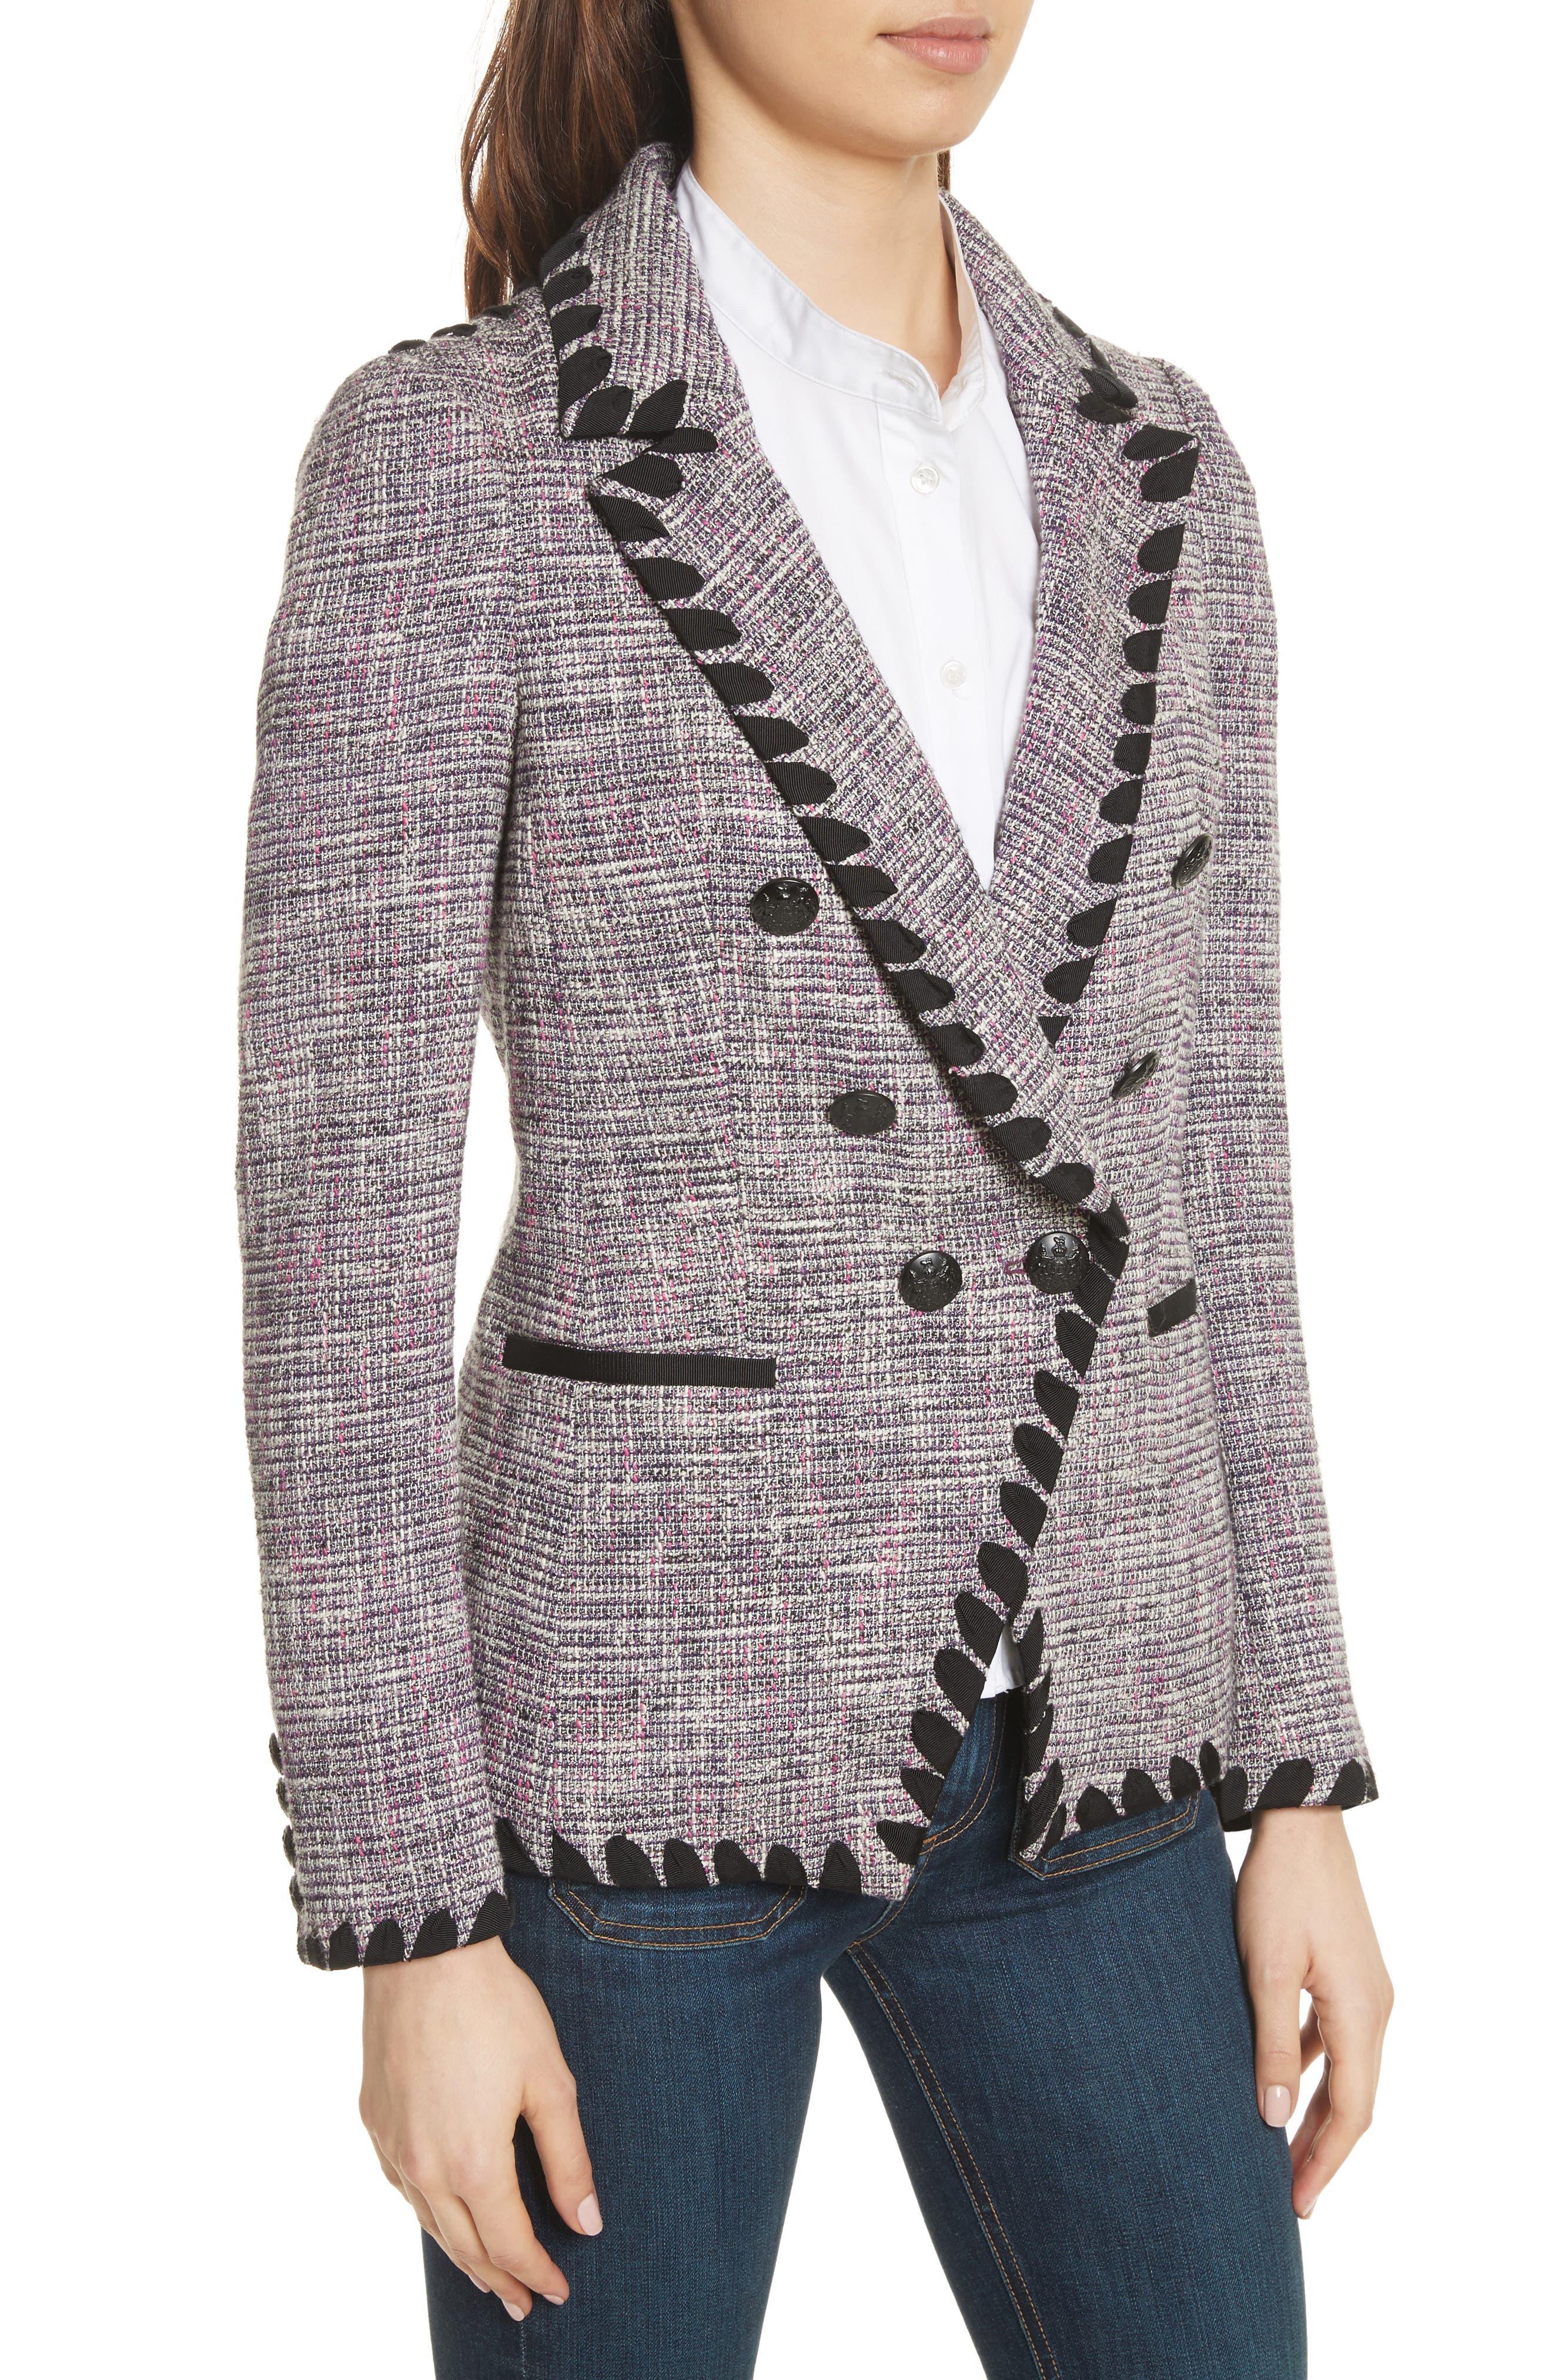 Octivia Tweed Blazer,                             Alternate thumbnail 4, color,                             Pink/ Black/ White